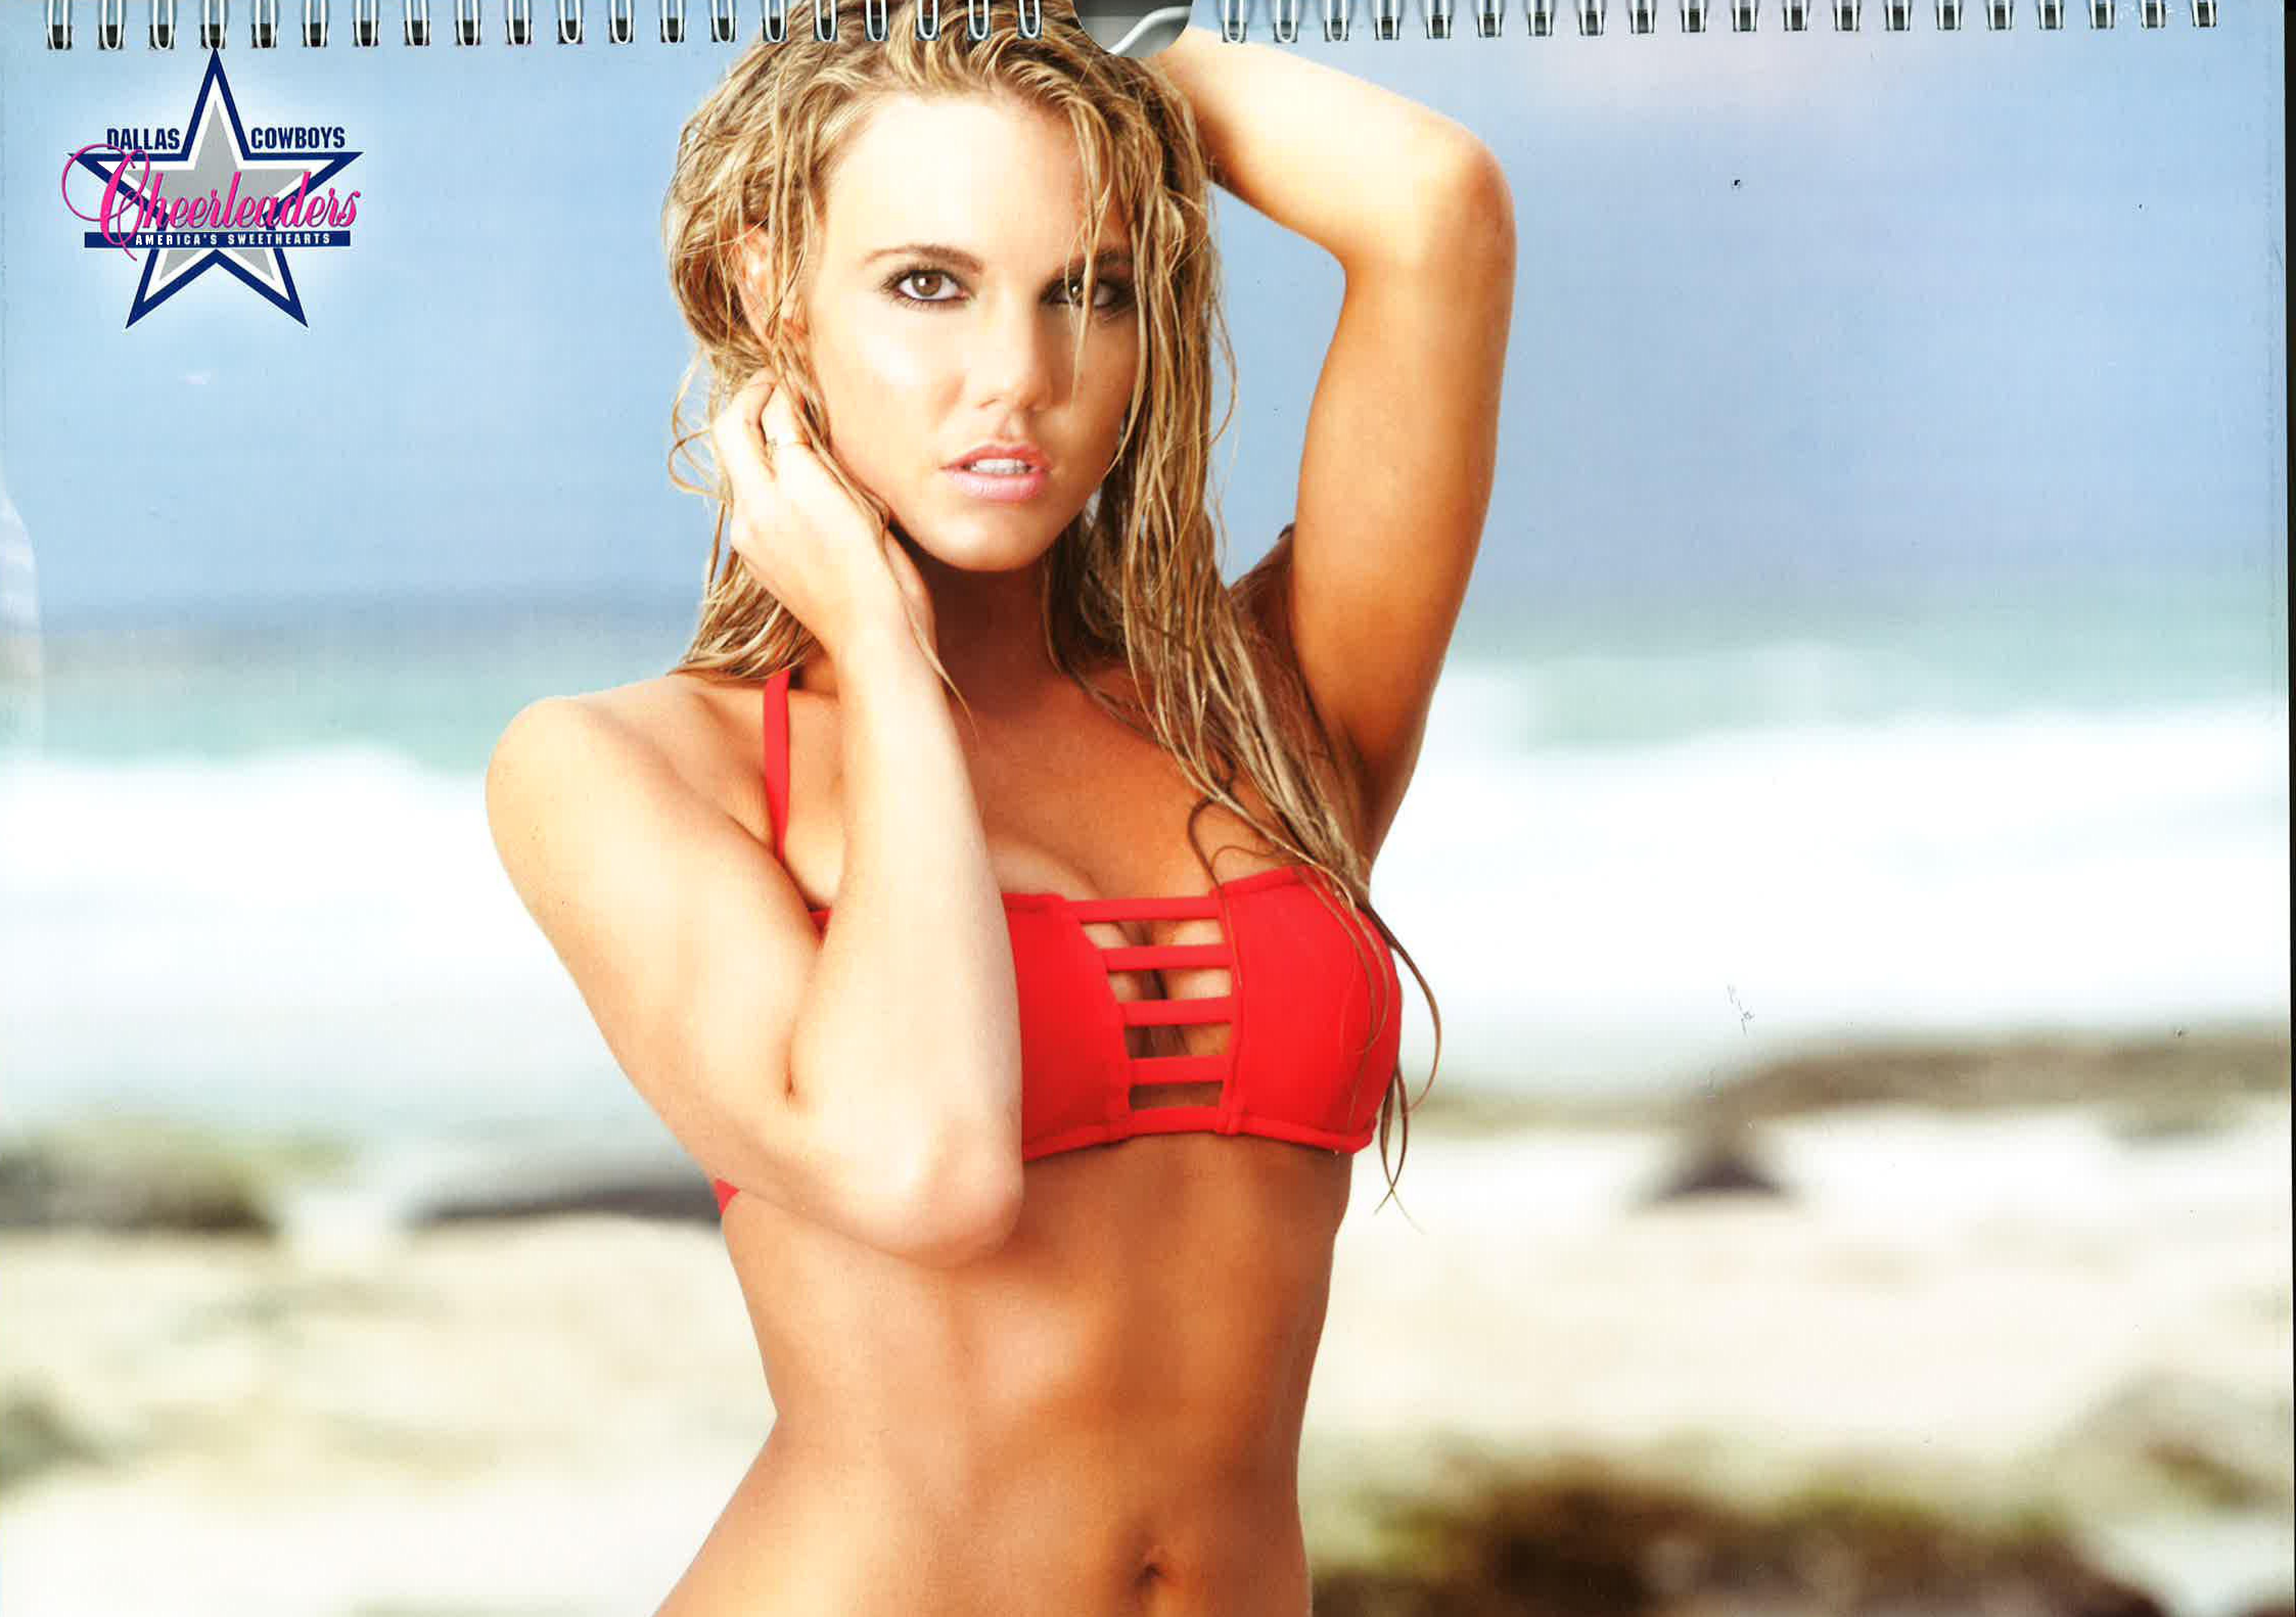 dallas cowboys cheerleaders bikini calendar